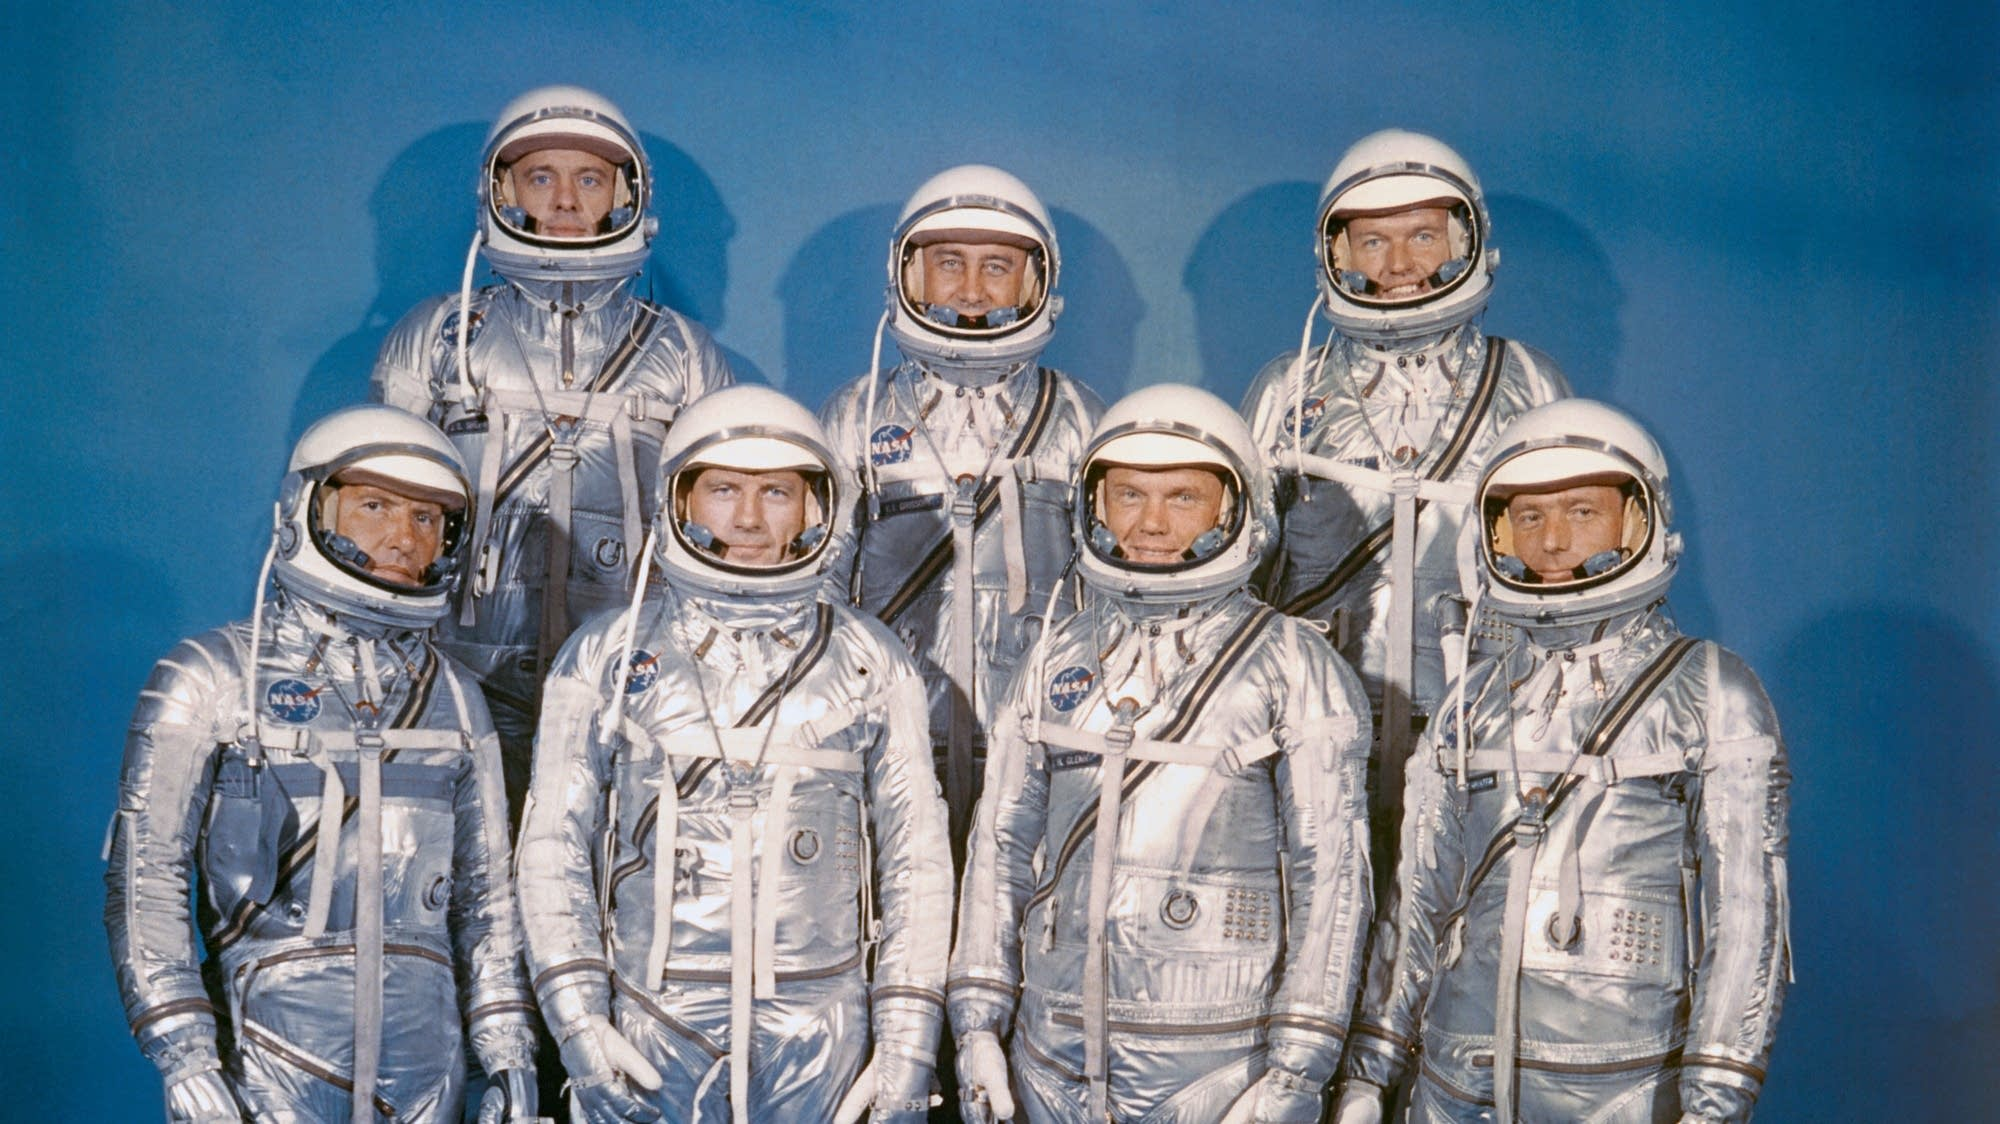 John Glenn, first American to orbit Earth, dies at 95 ...